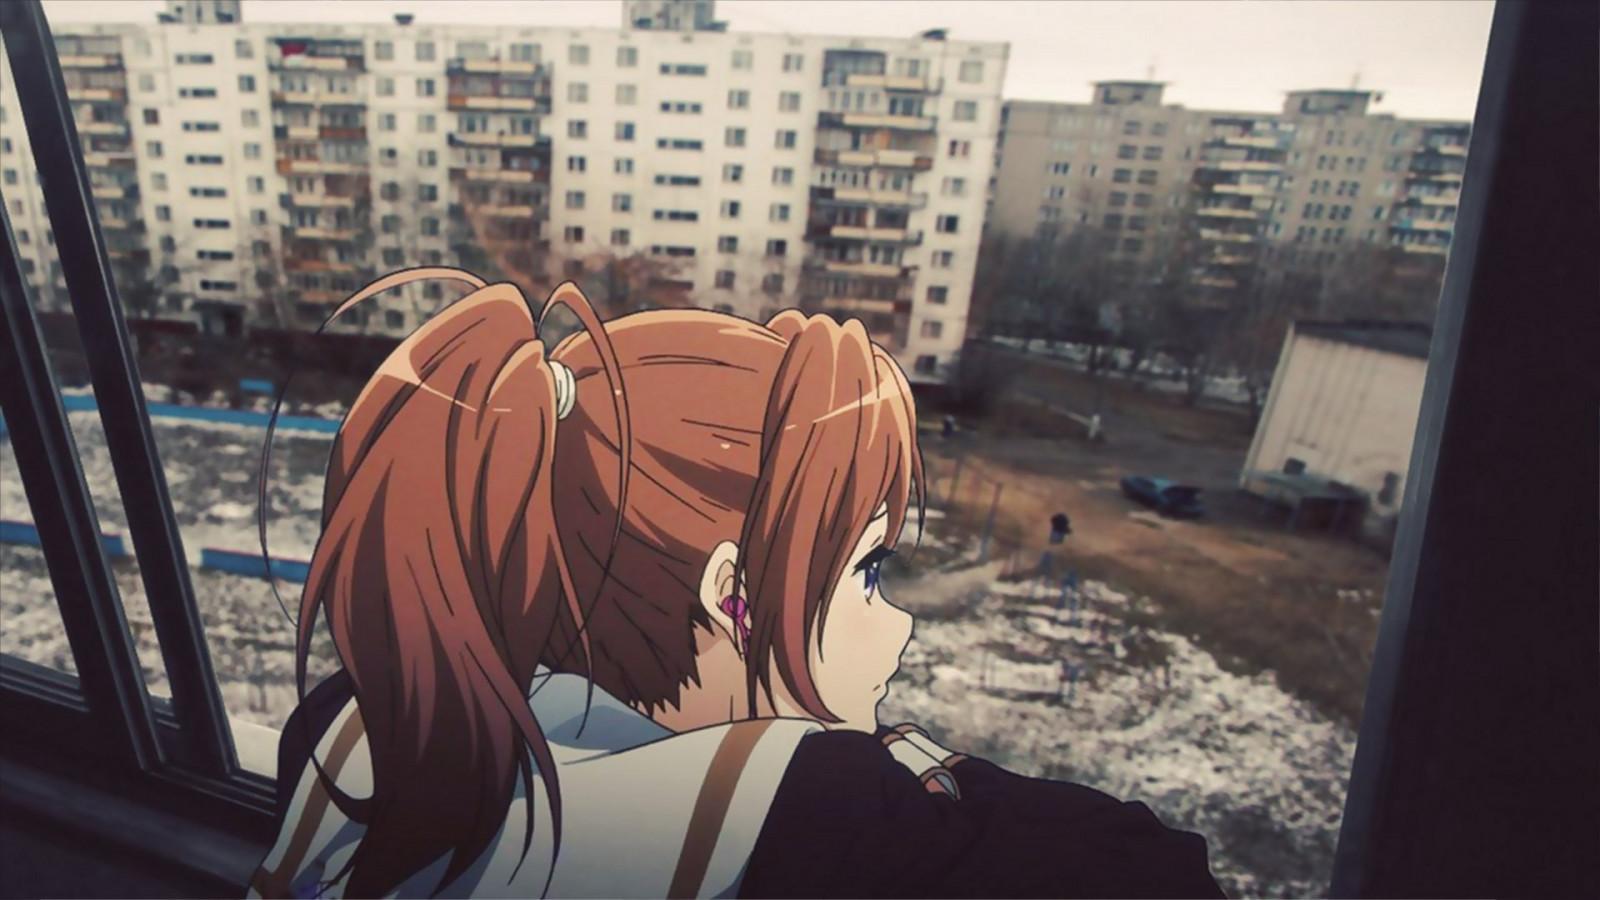 artwork_urban_alone_window_headphones_Hibike_Euphonium_looking_away-103594.jpg!d